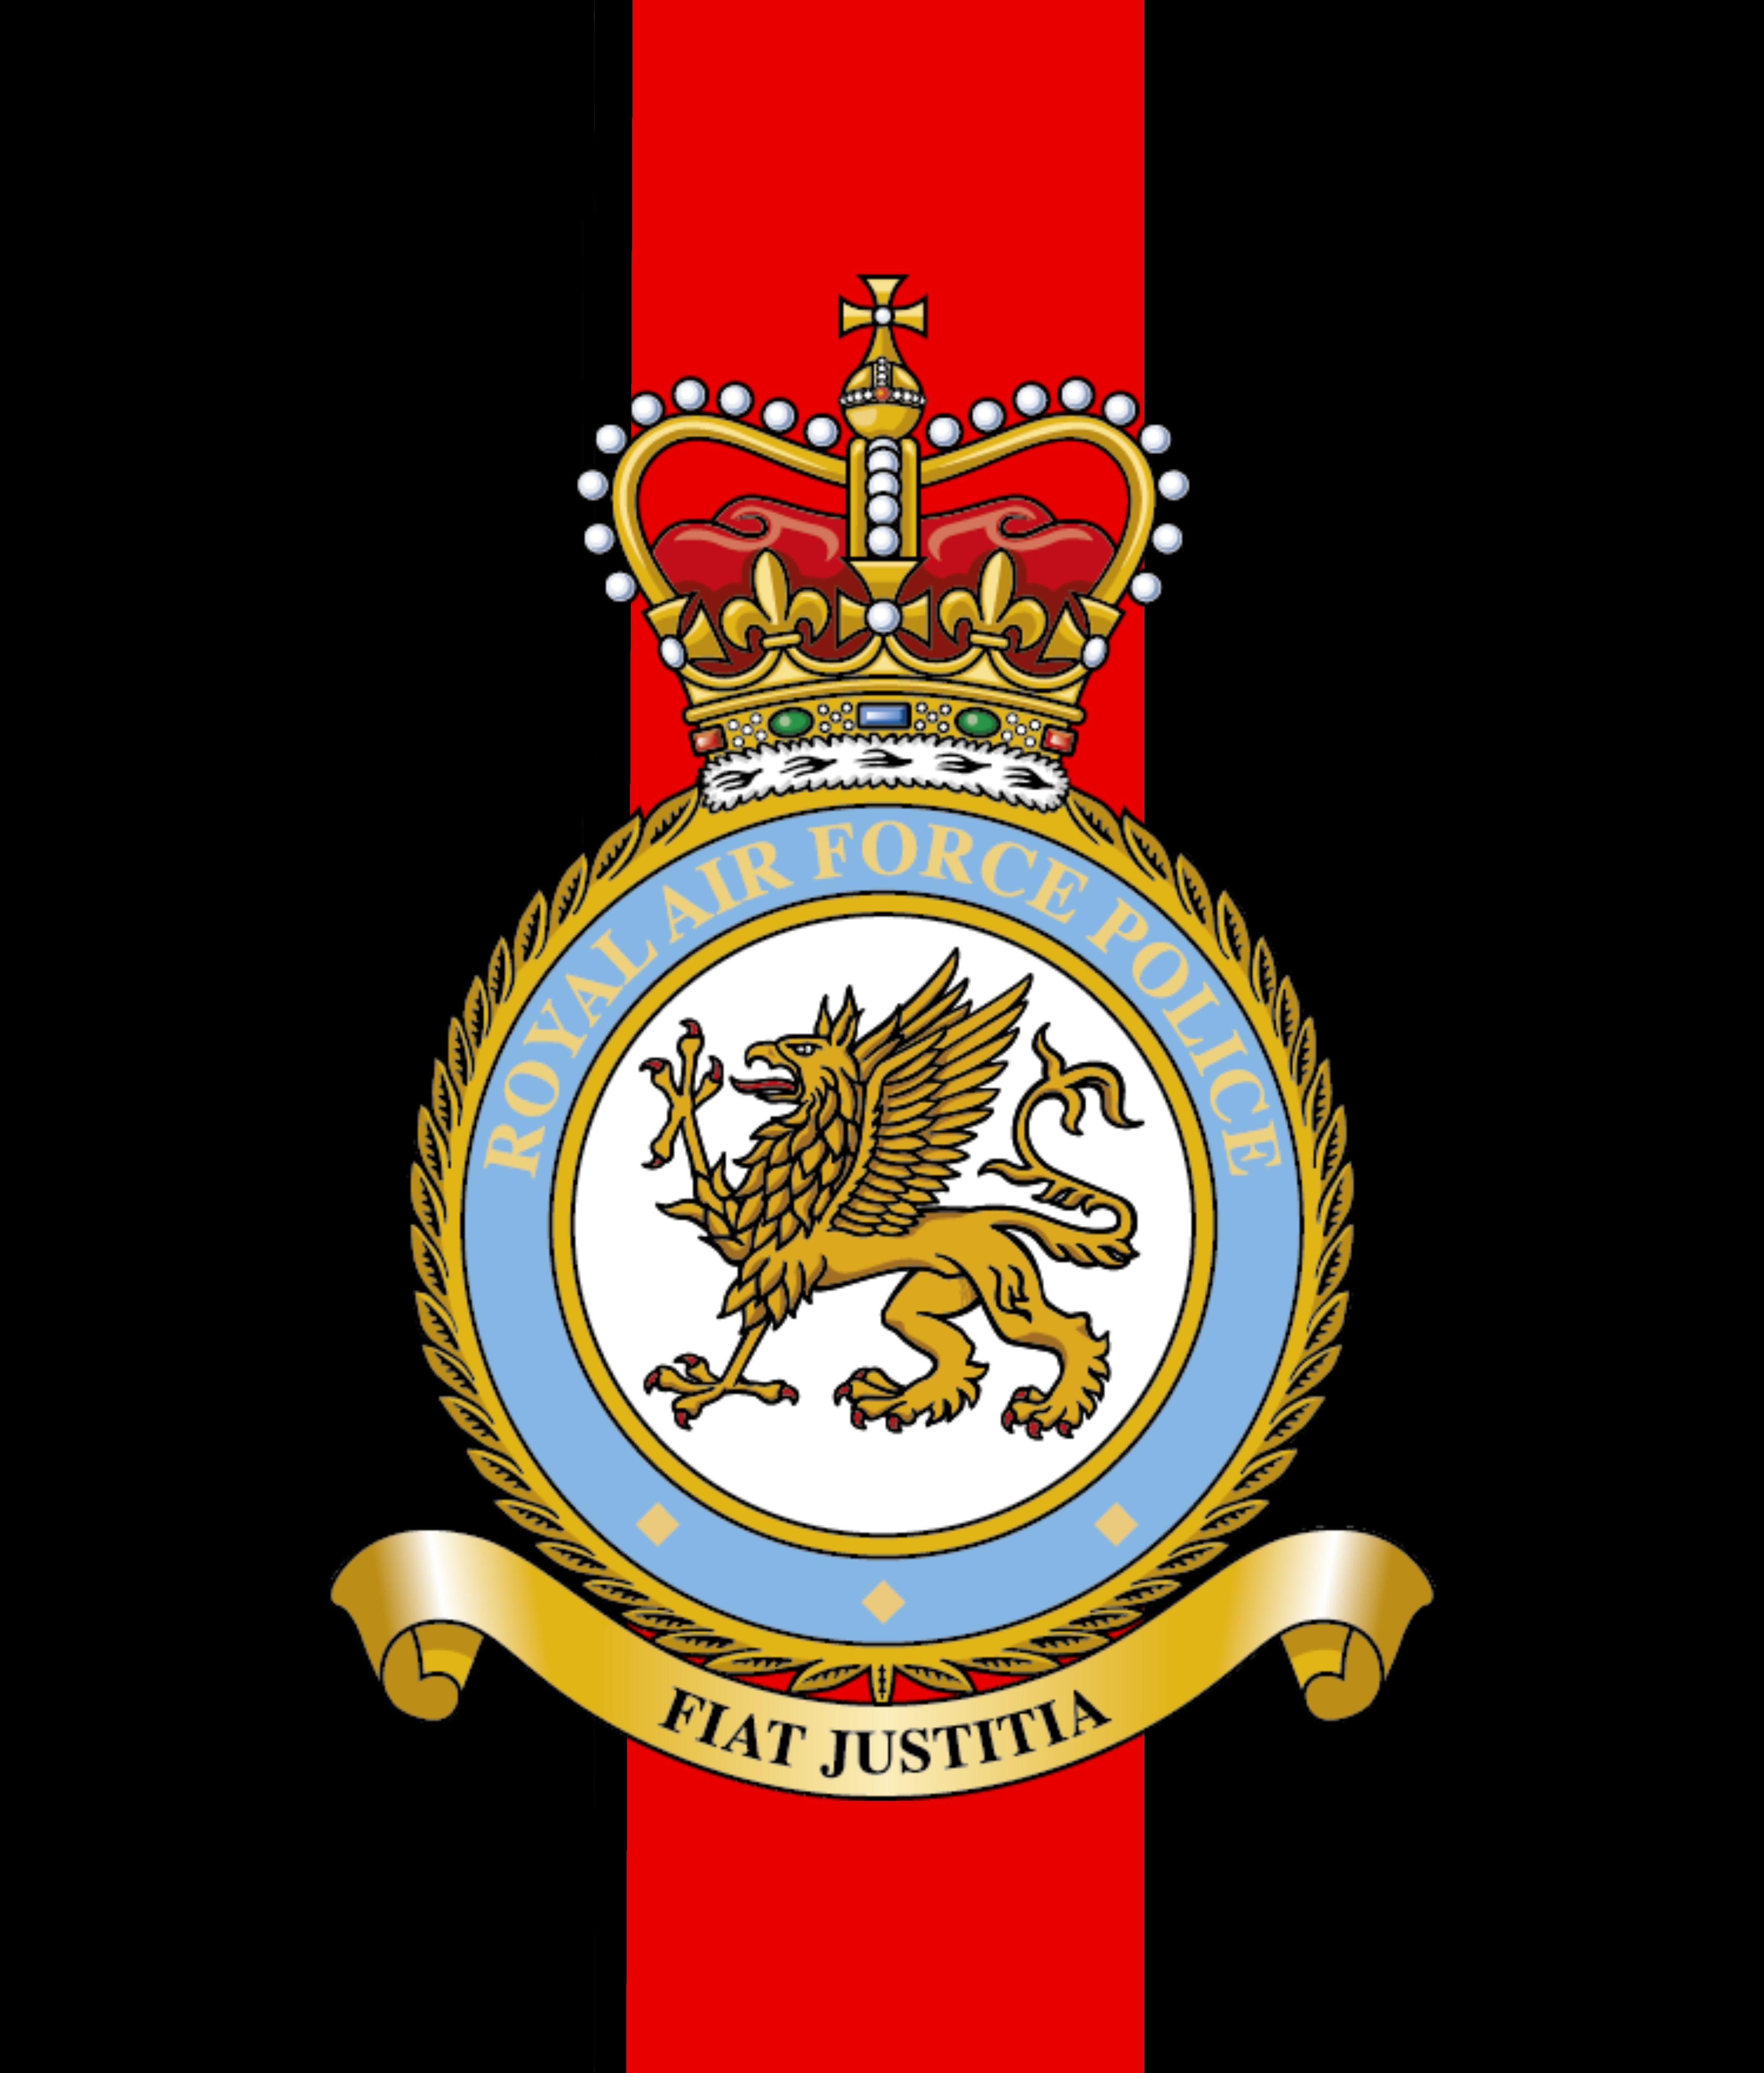 RAF Royal Air Force Red Arrows Aerobatic Team Crest Pin Badge